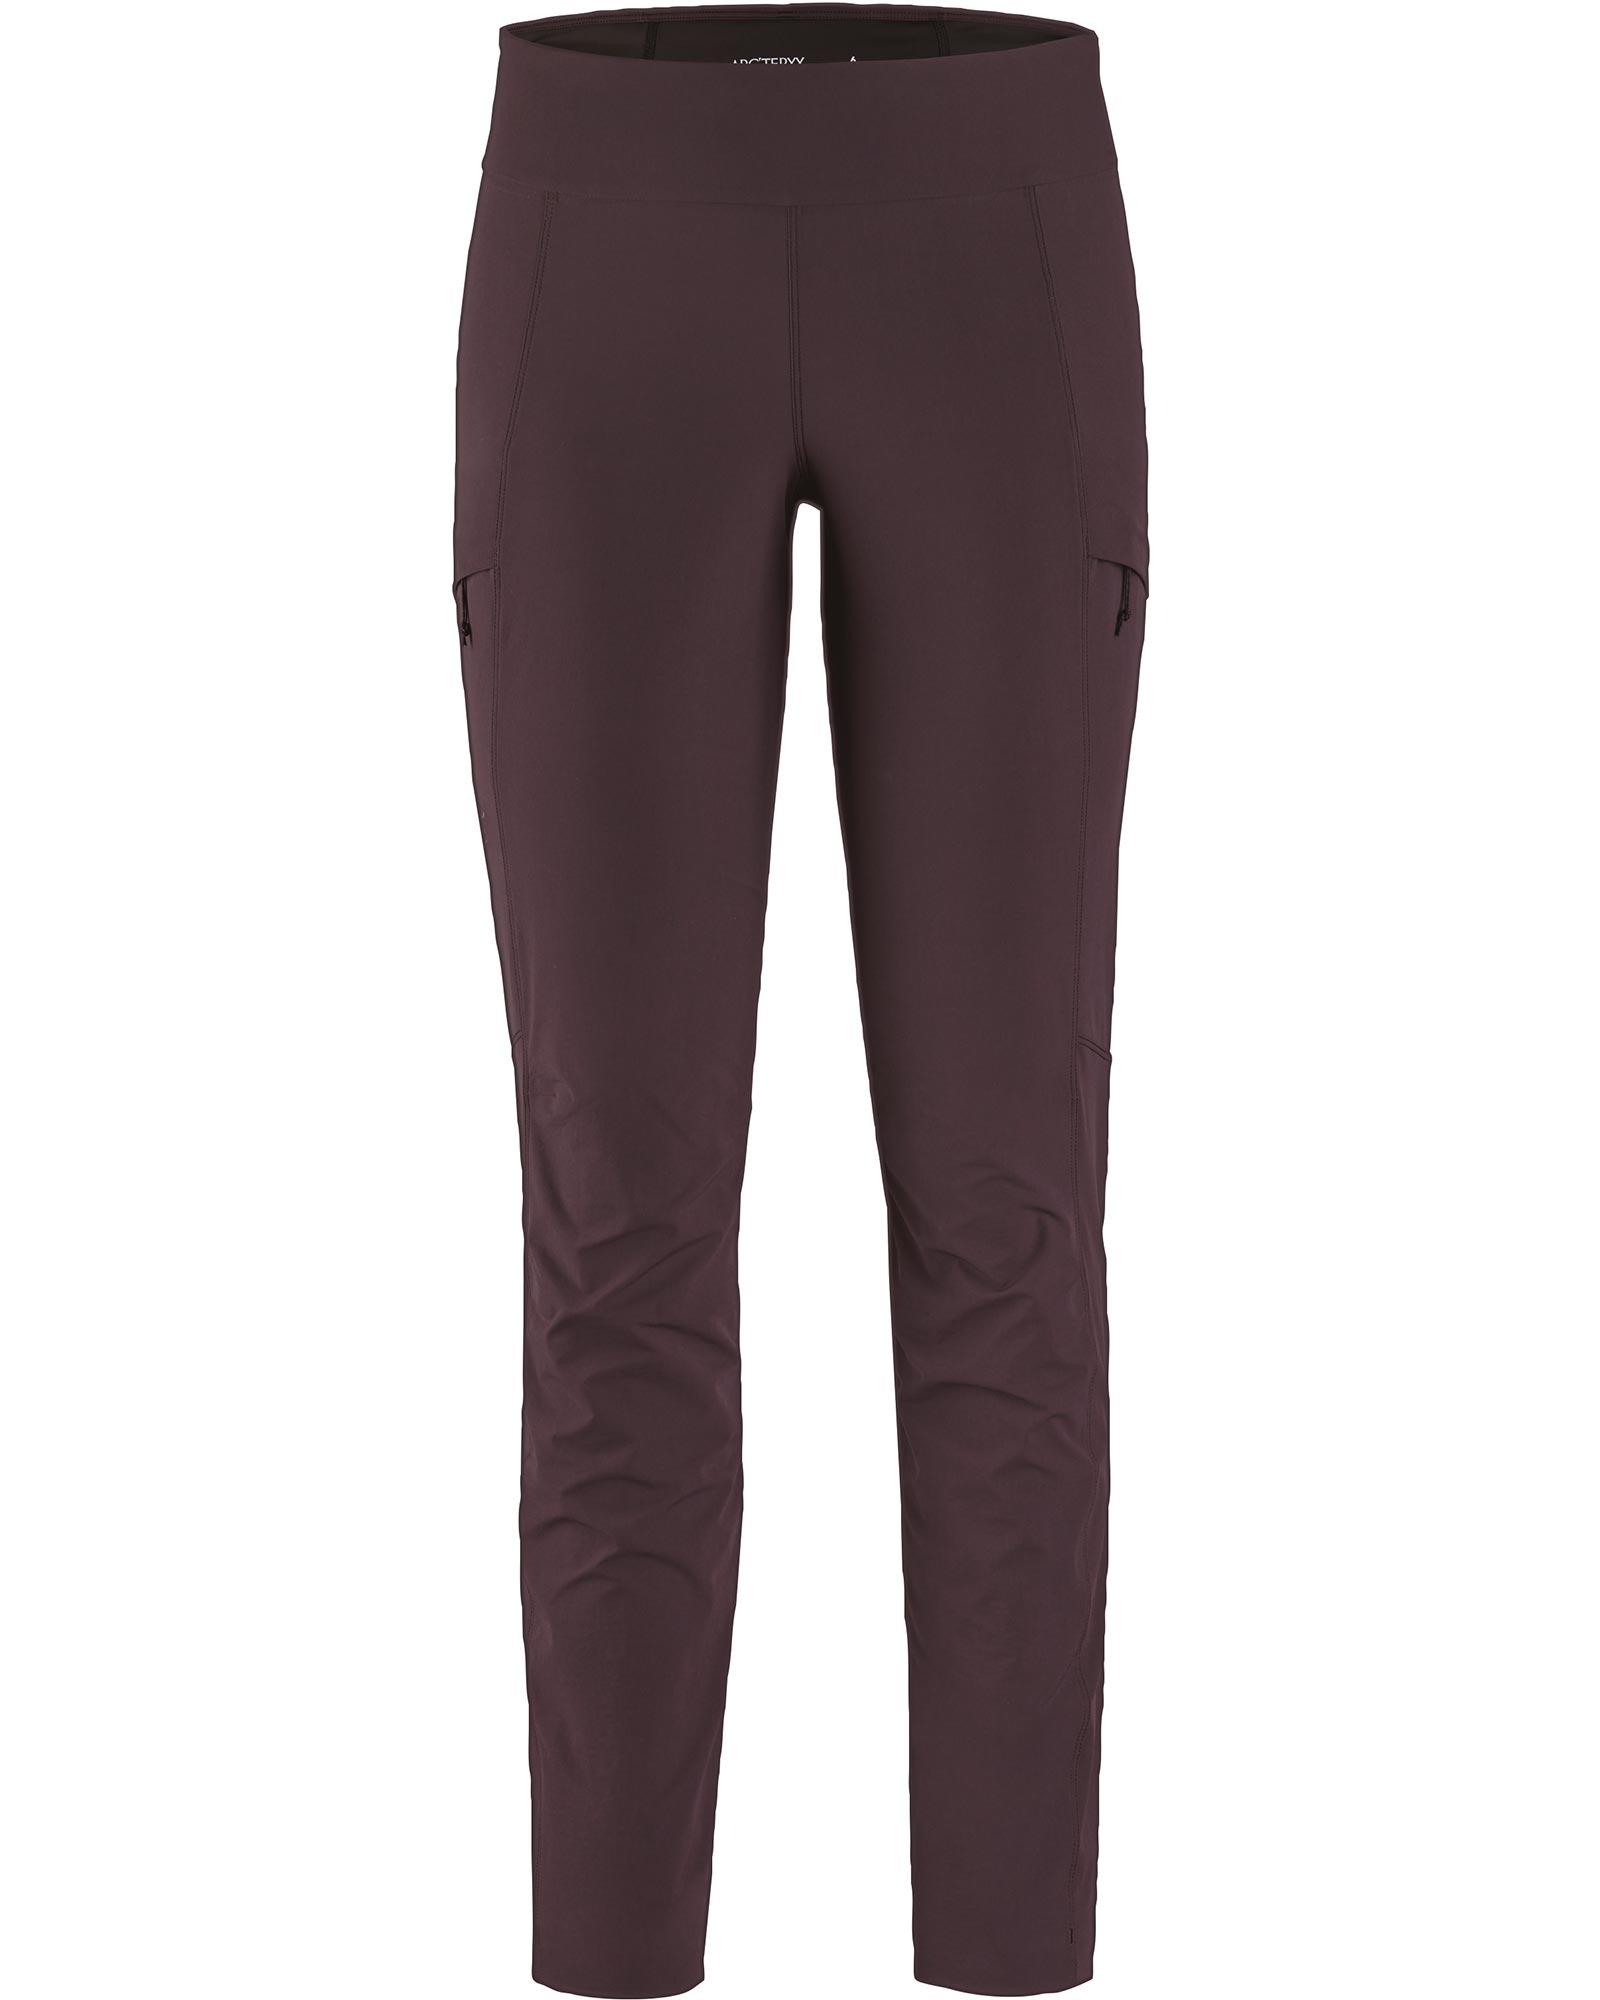 Arc'teryx Women's Sabria Hike Pants Regular Leg 0